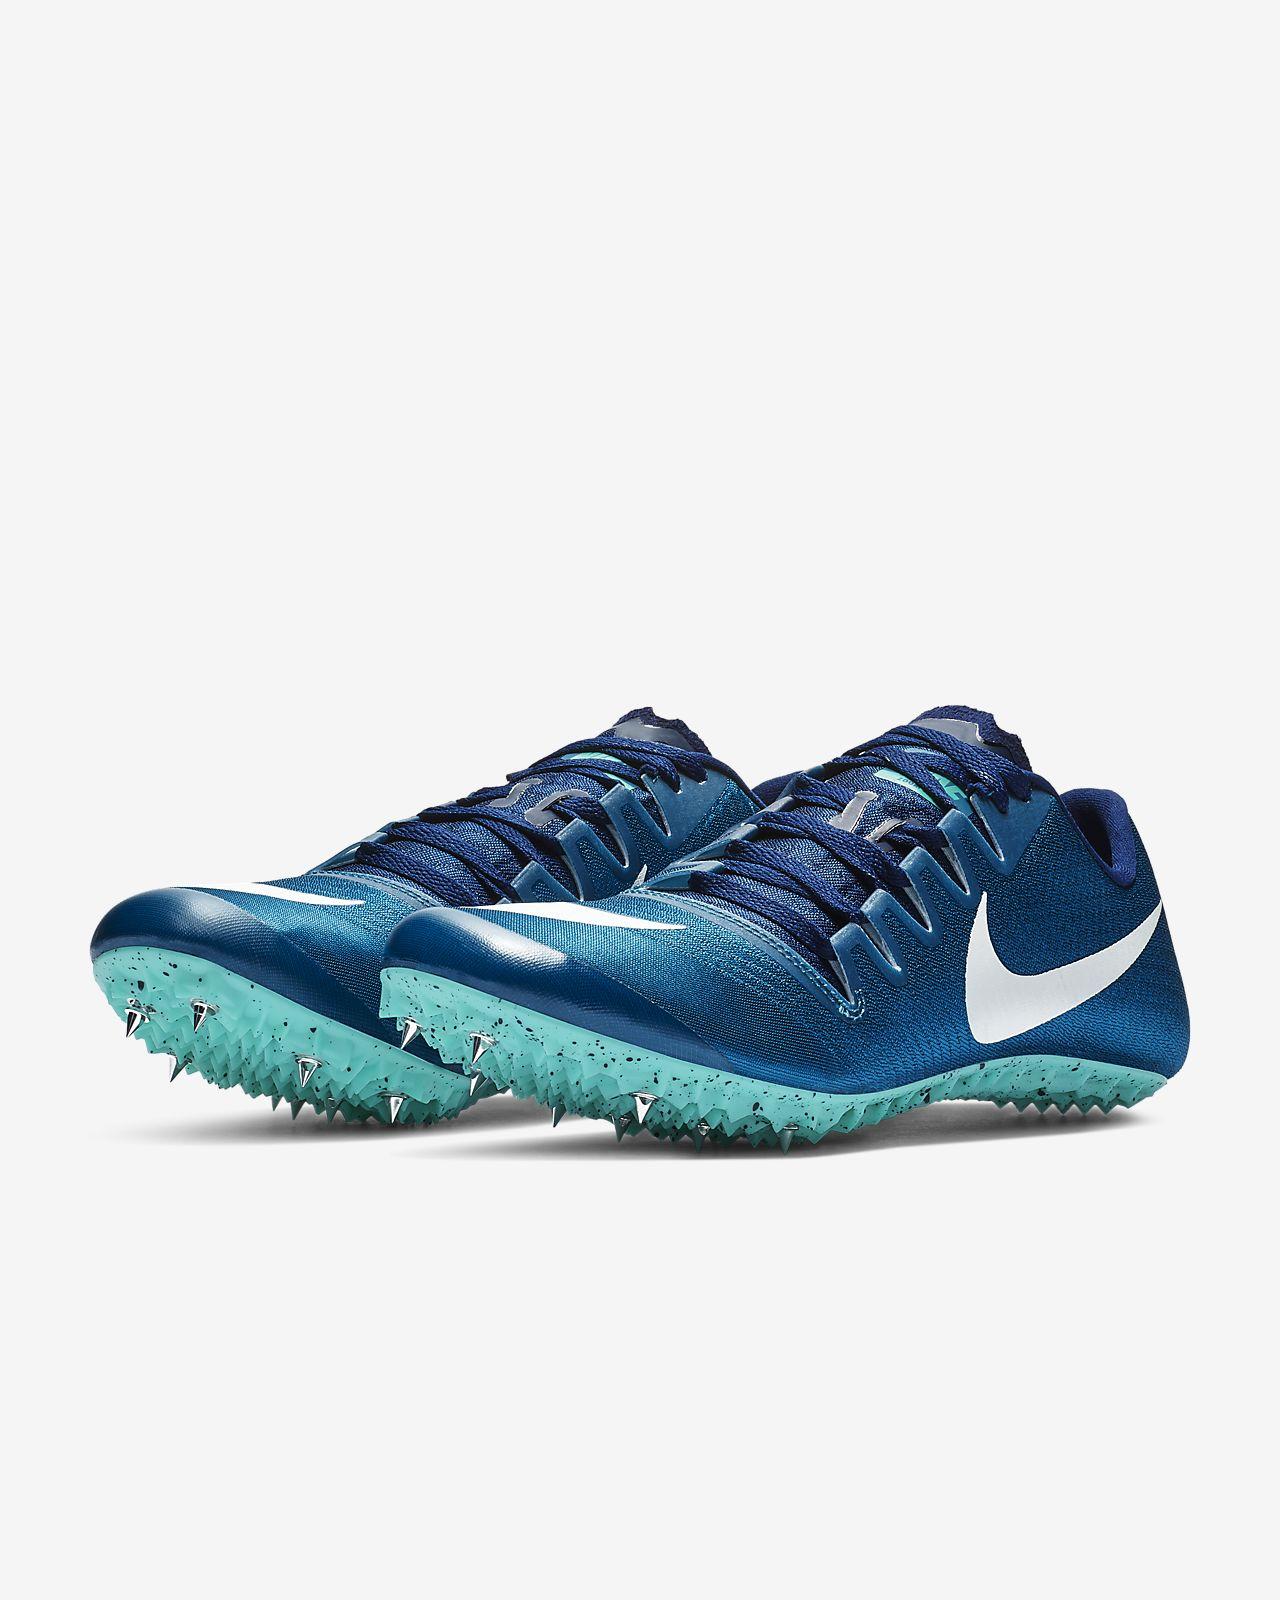 wholesale dealer c9662 6224f ... Nike Zoom Ja Fly 3 Unisex Track Spike